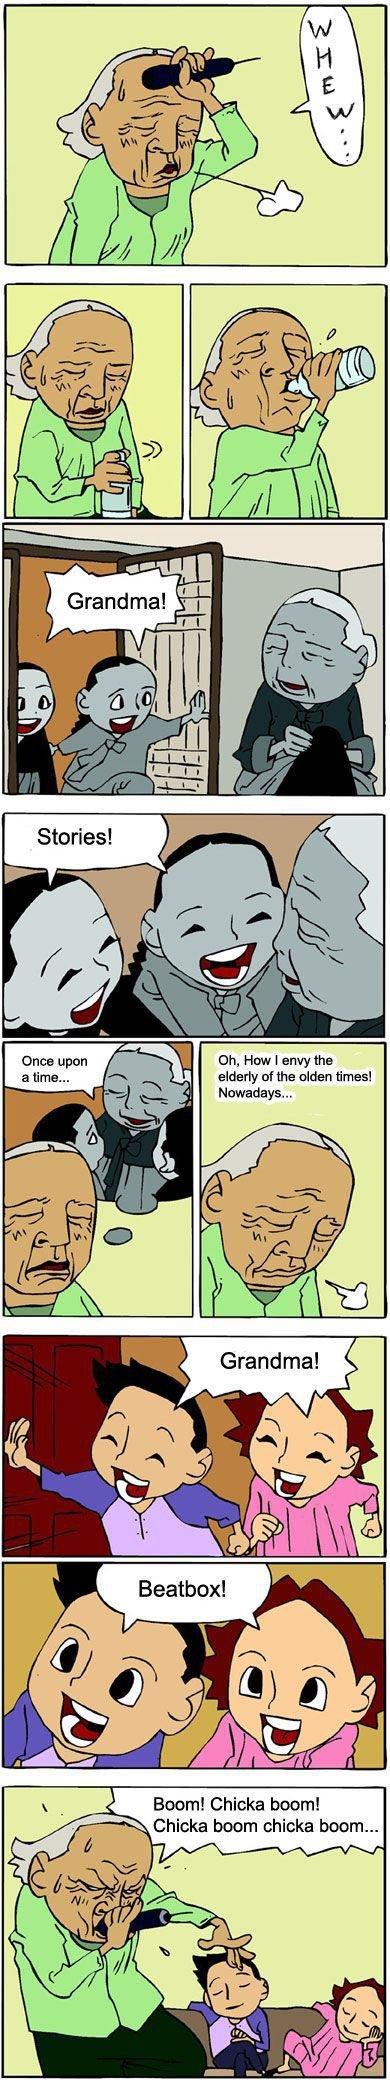 Grandma's Story Time. Righty right. Korean comic beatbox grandma children